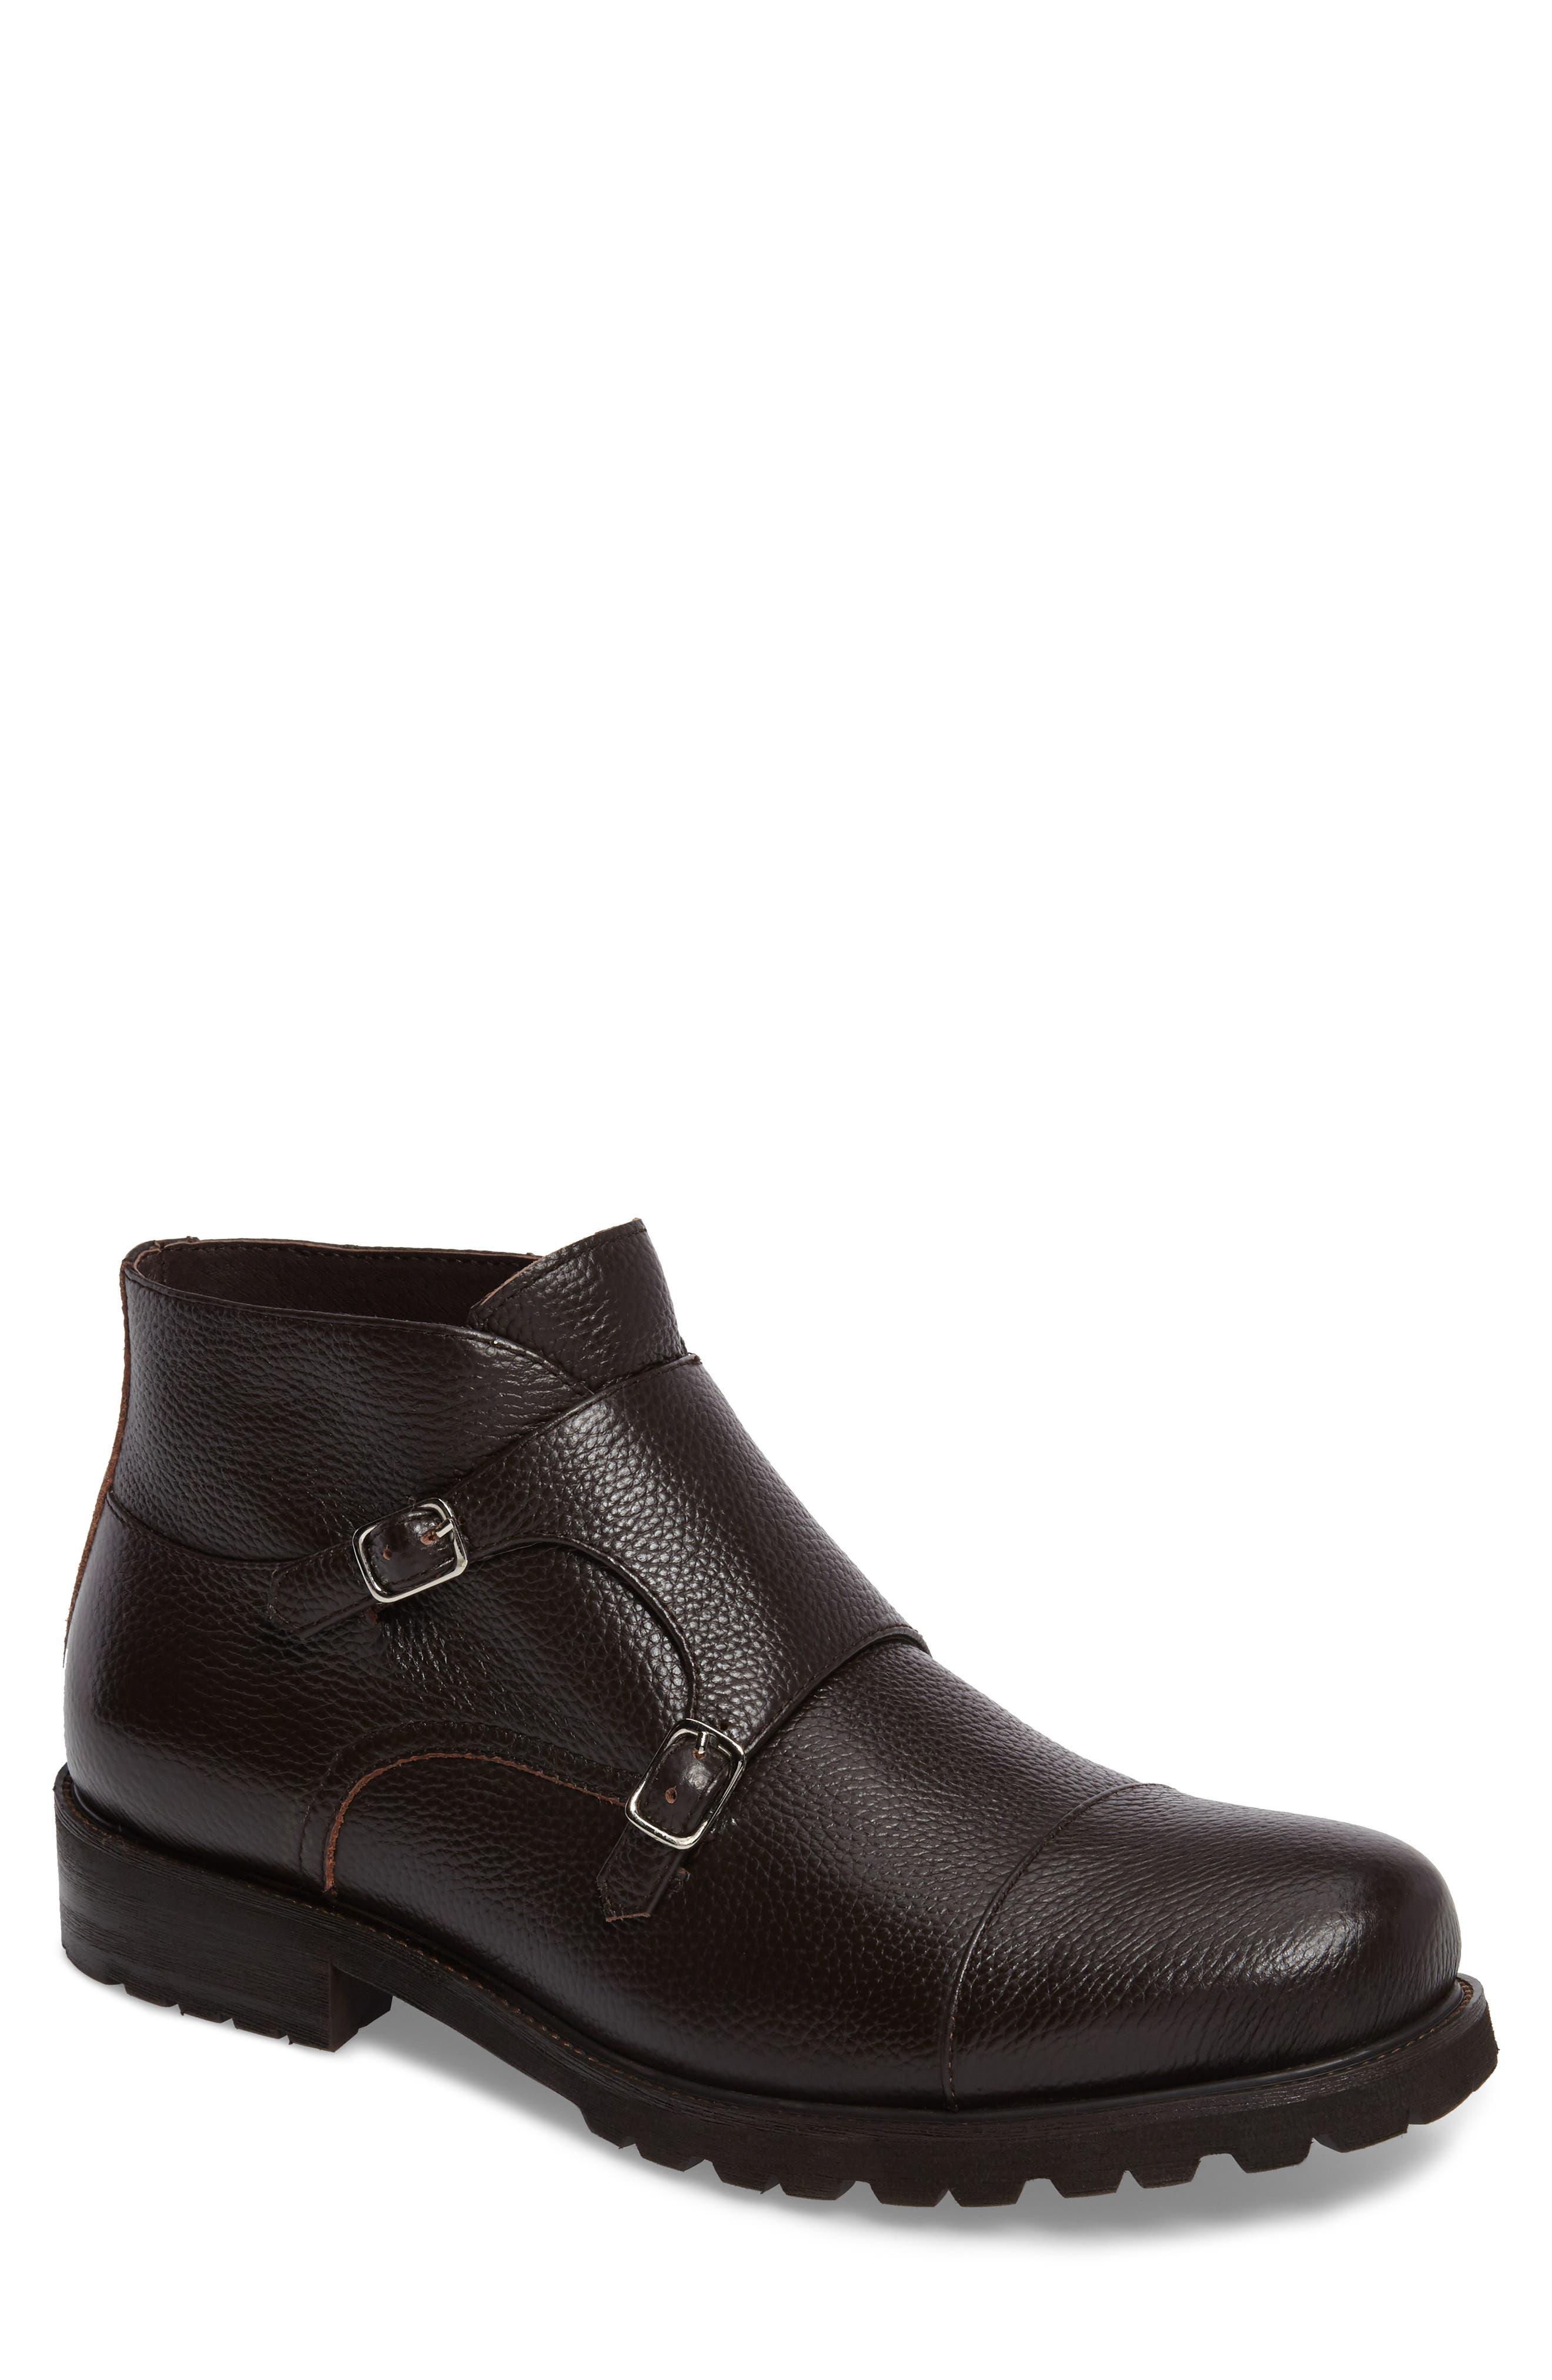 Koller Cap Toe Double Monk Boot,                         Main,                         color, Black Leather